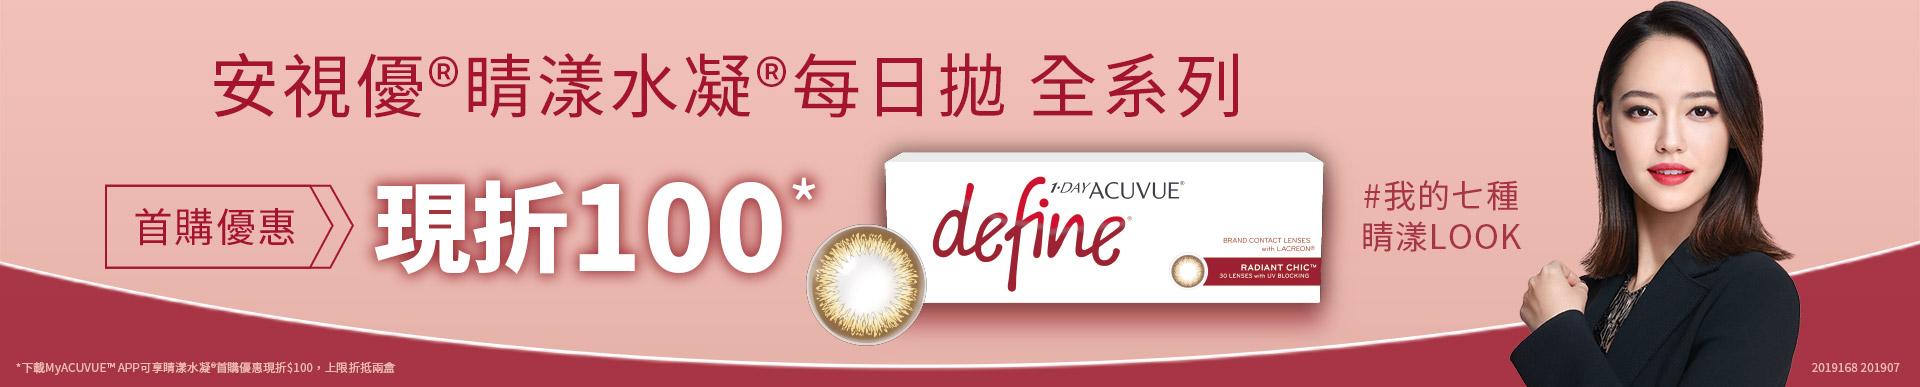 homepage-banner-new.jpg